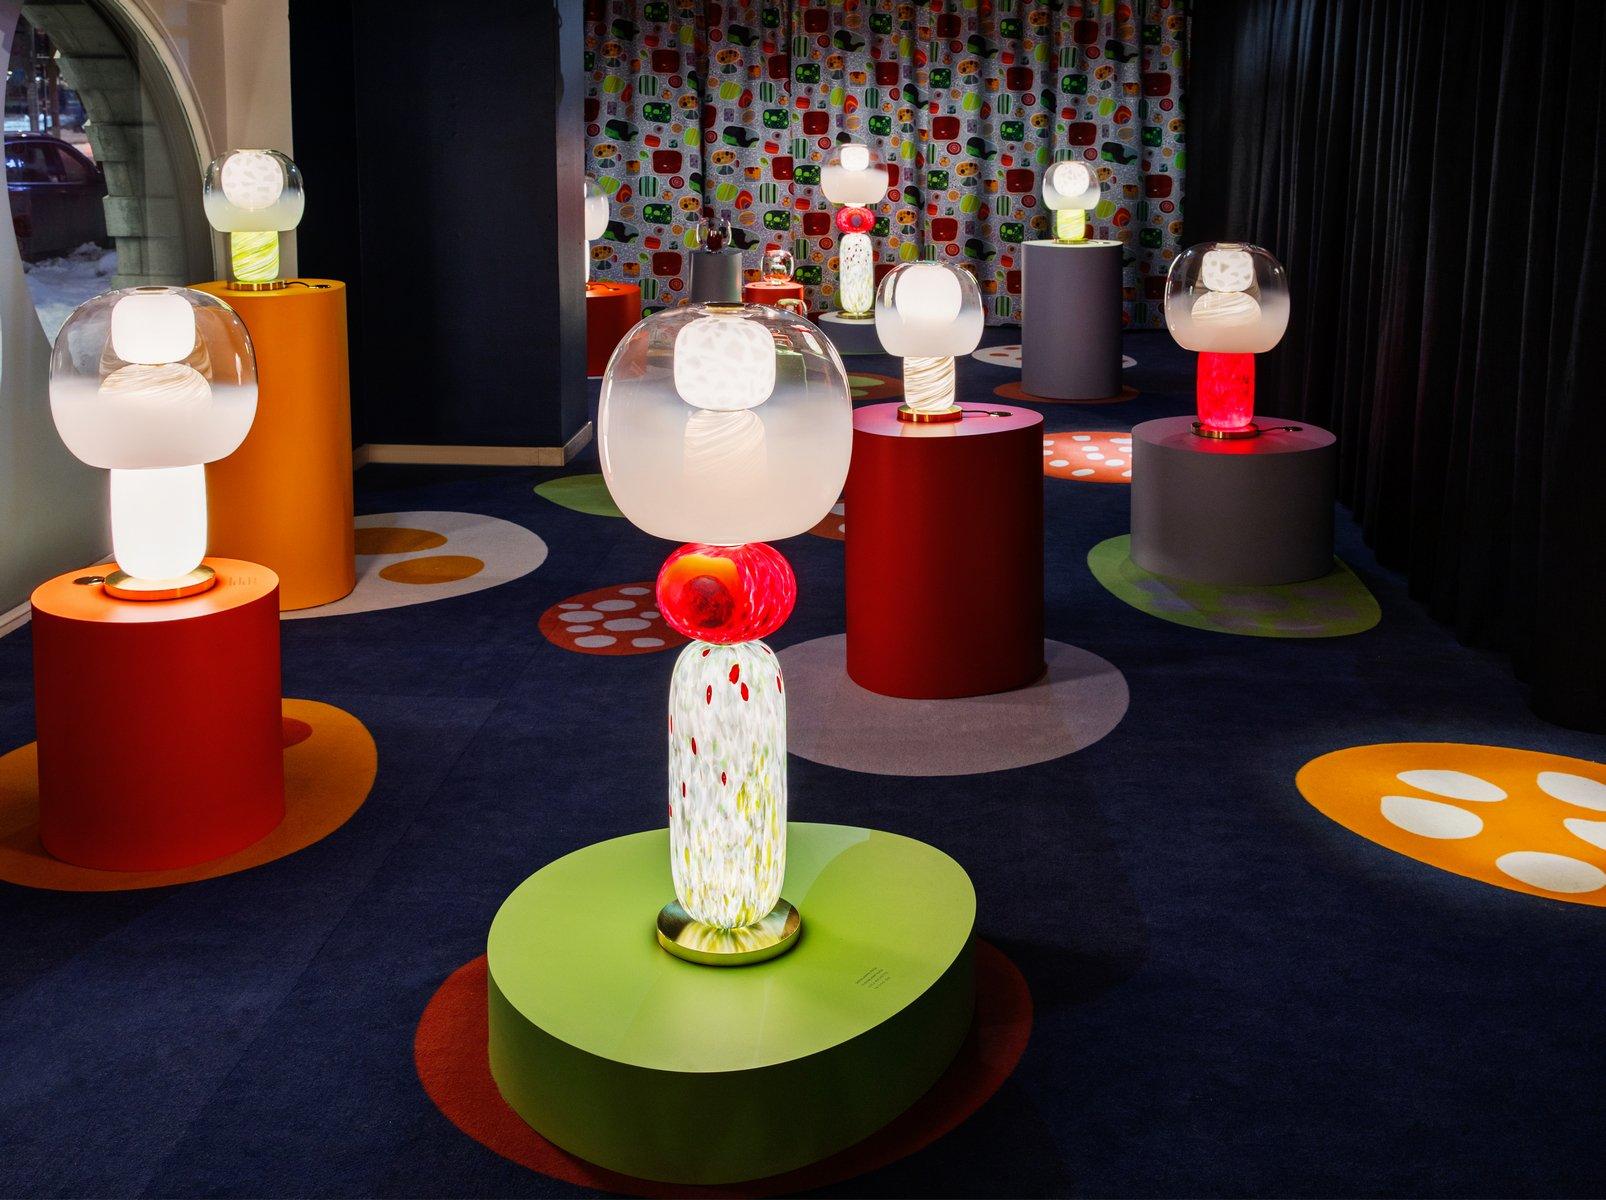 Design-by-Josef-Franck-in-glass- interpretation-Design-by-Josef-Franck-in-glass- interpretation-01